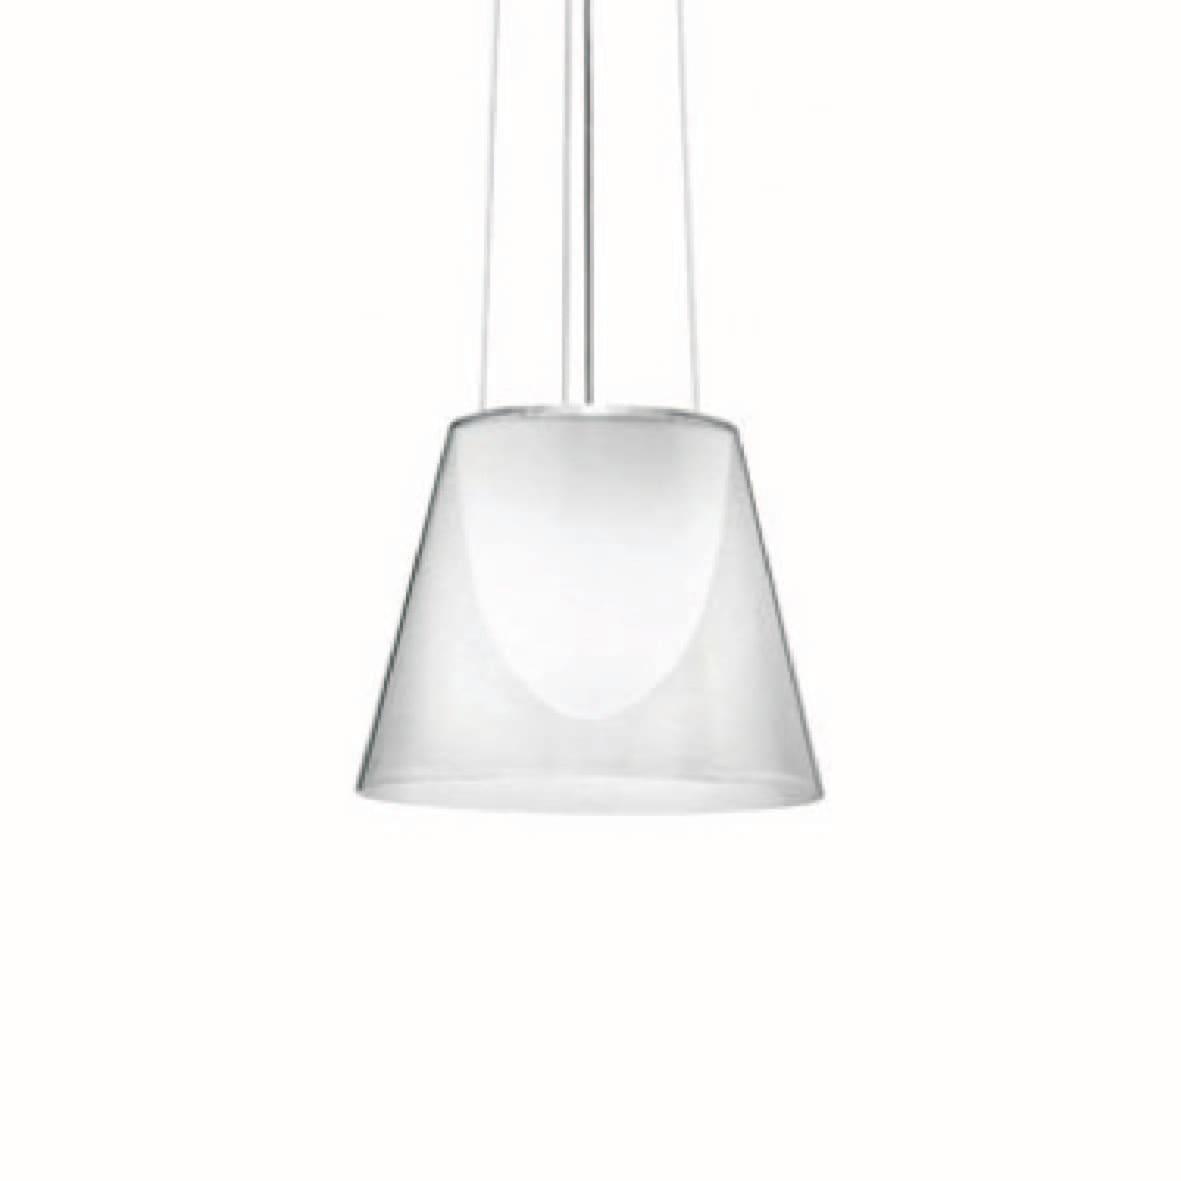 Transparente - +245,88US$